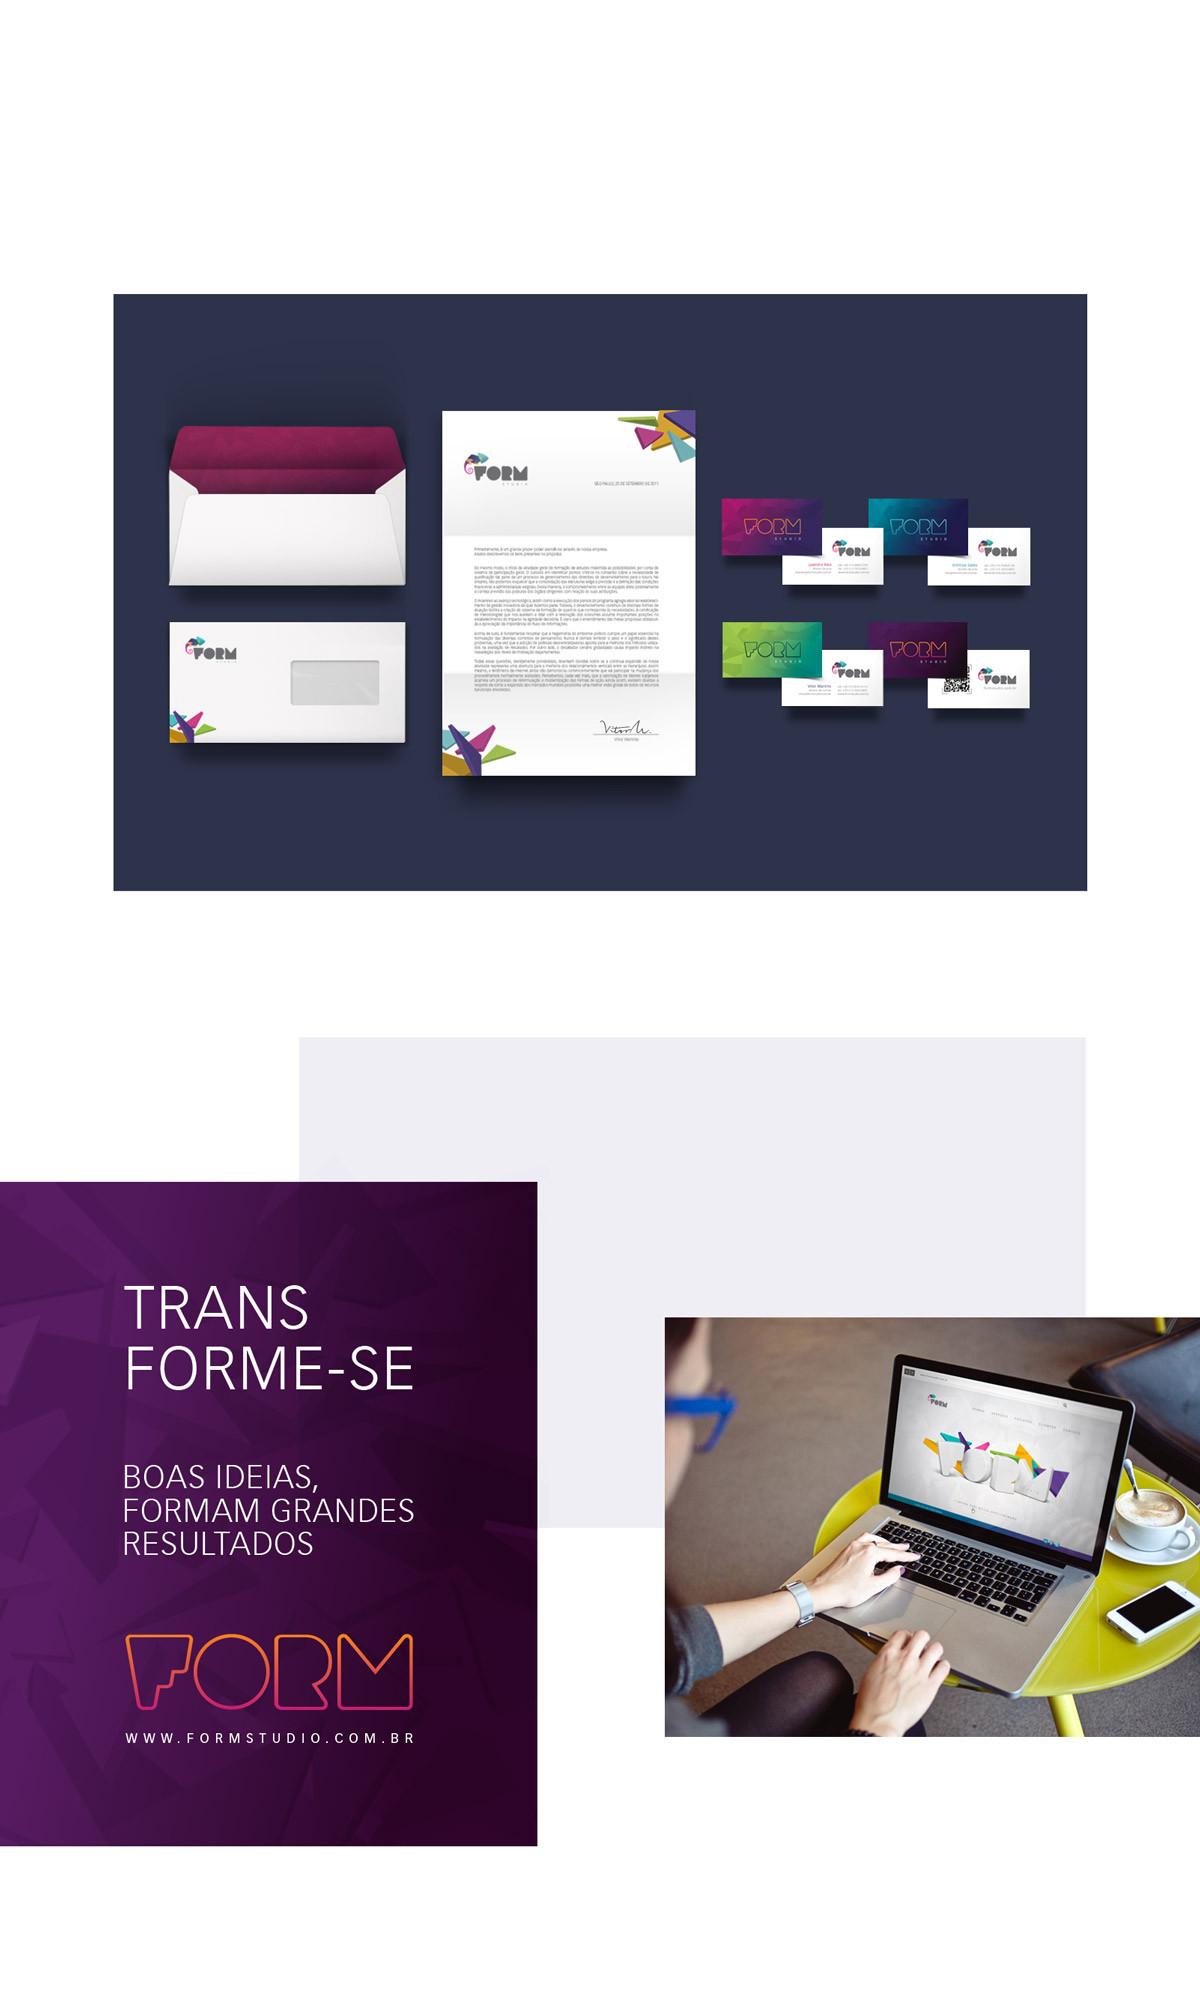 Form Studio identidade visual